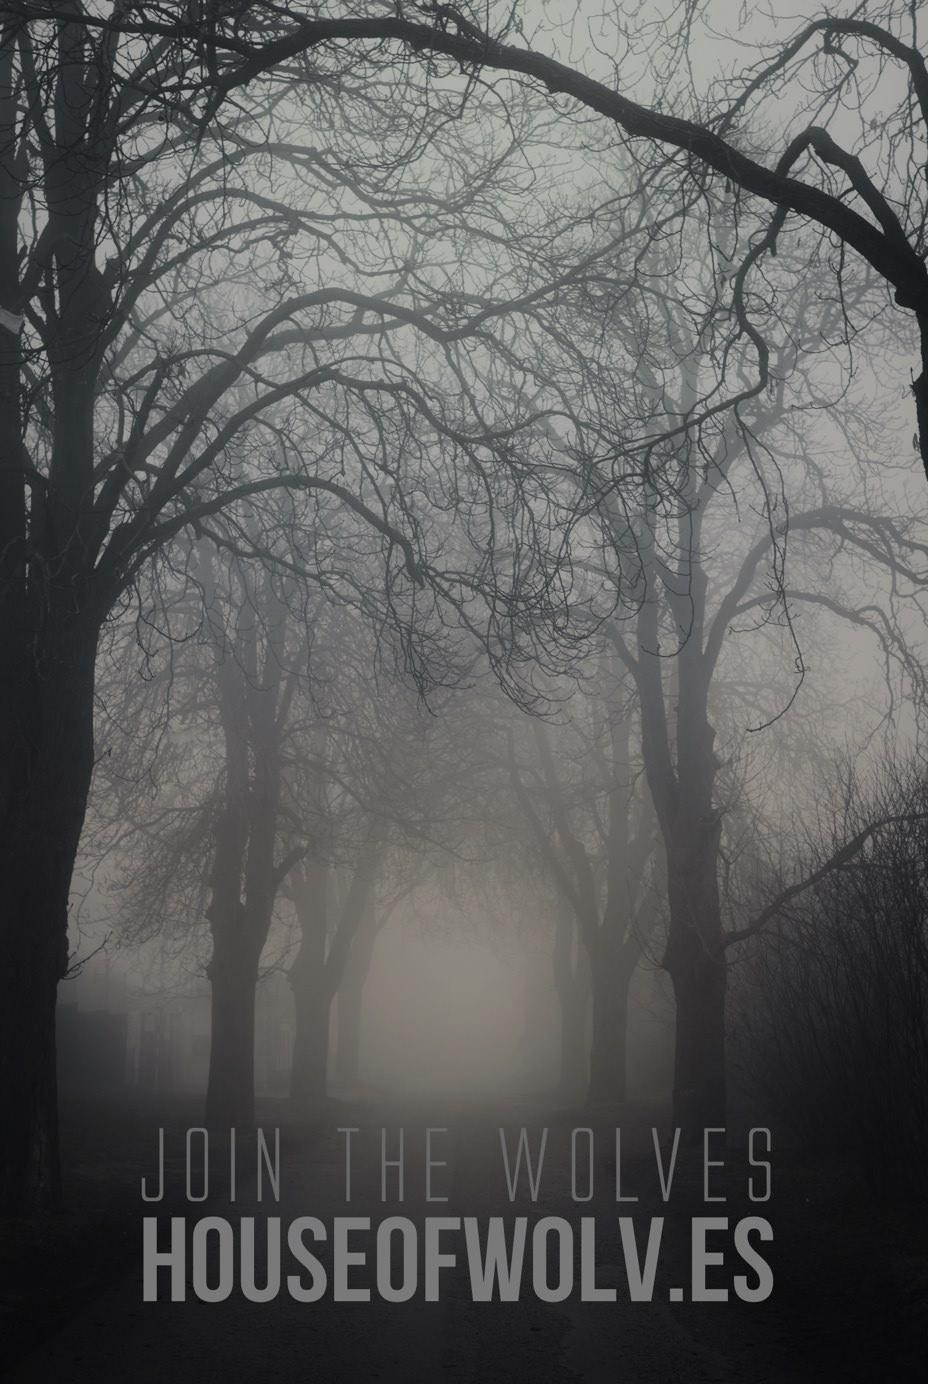 house-of-wolves-business-card-back-ryanalvarado